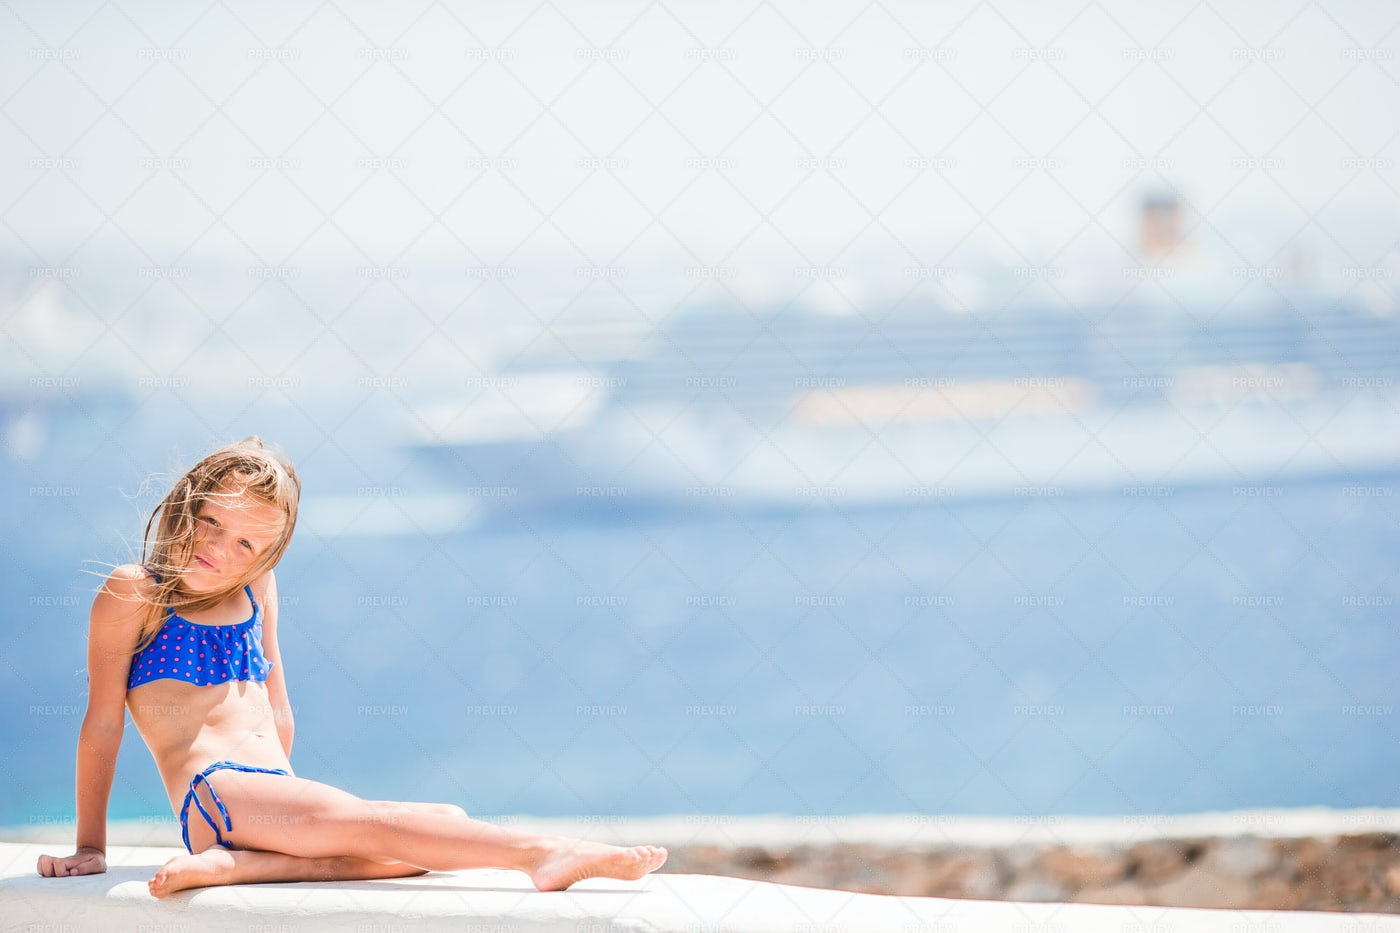 Beach Stop On Cruise Vacation: Stock Photos